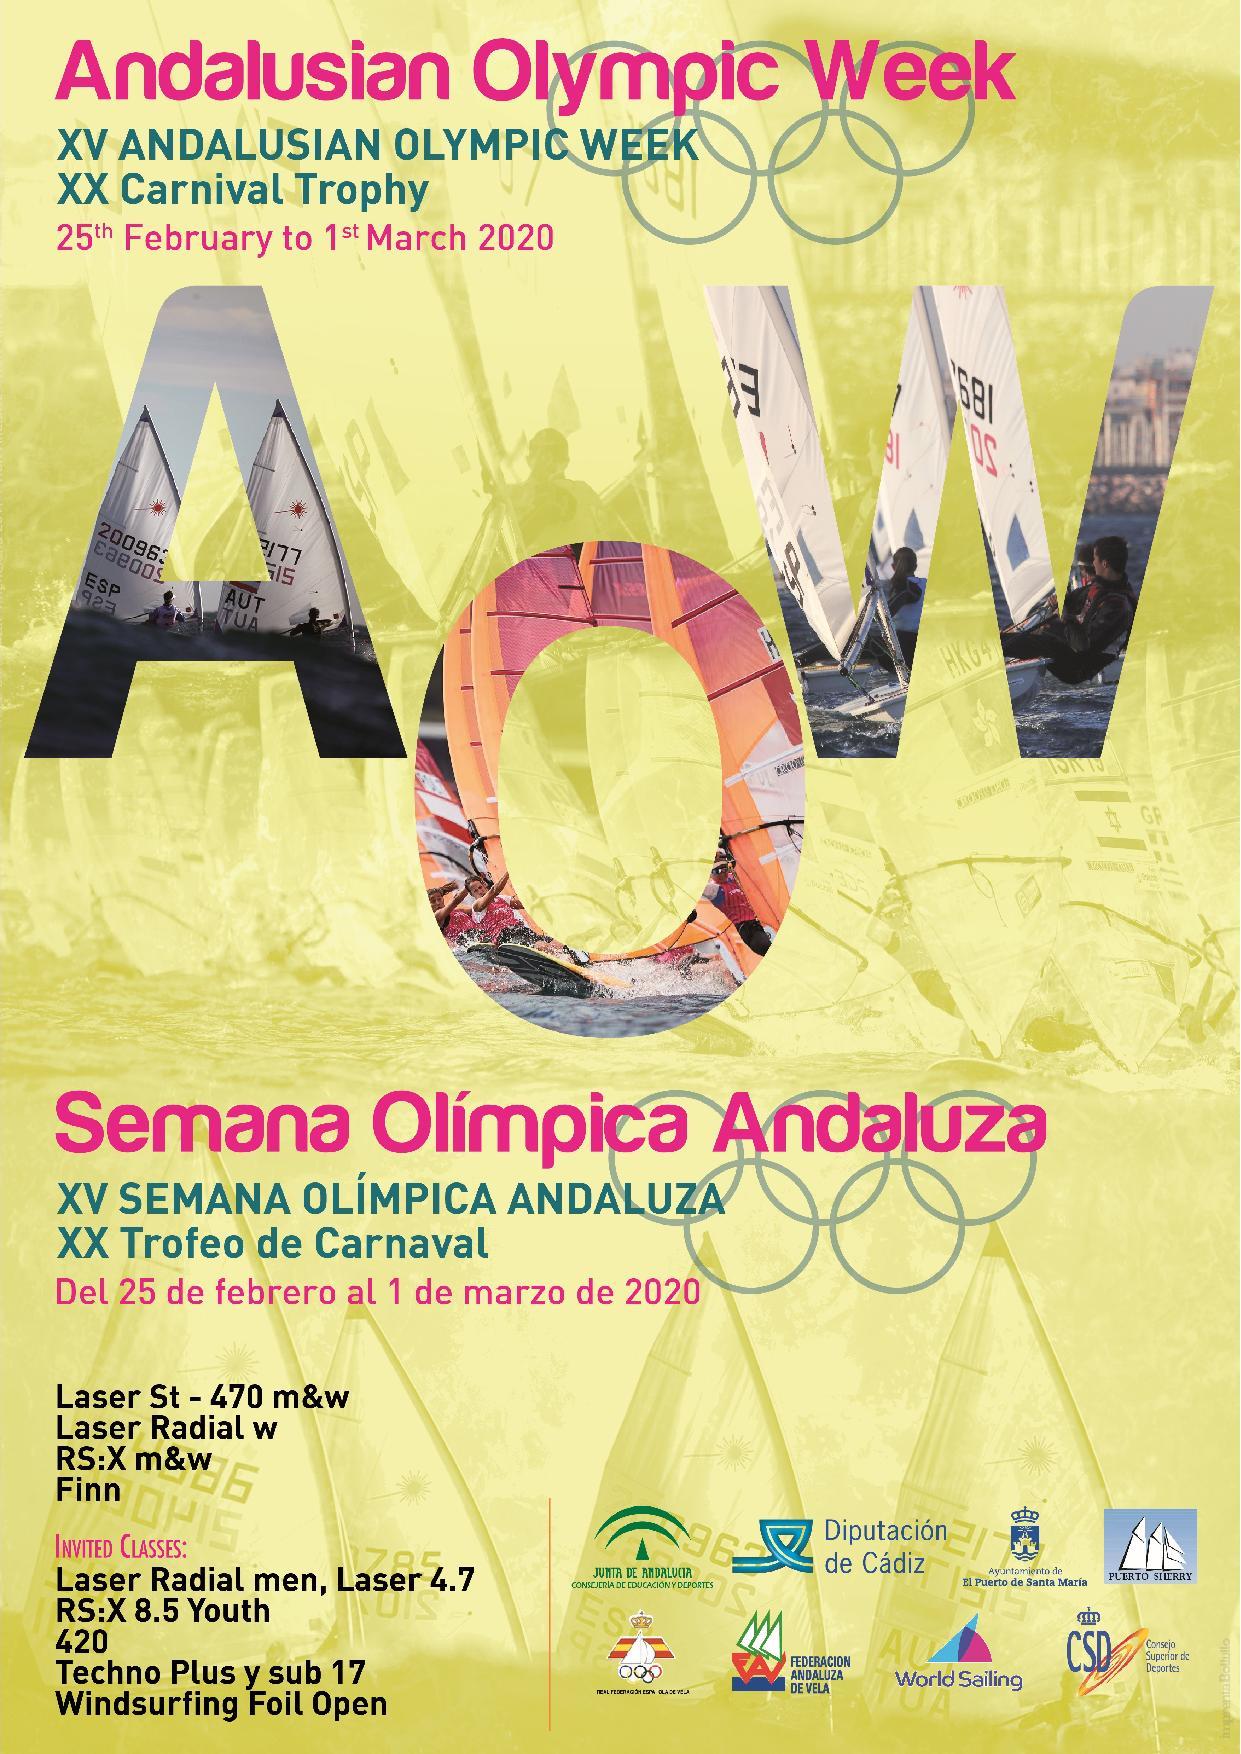 XV Semana Olímpica Andaluza, XX Trofeo De Carnaval